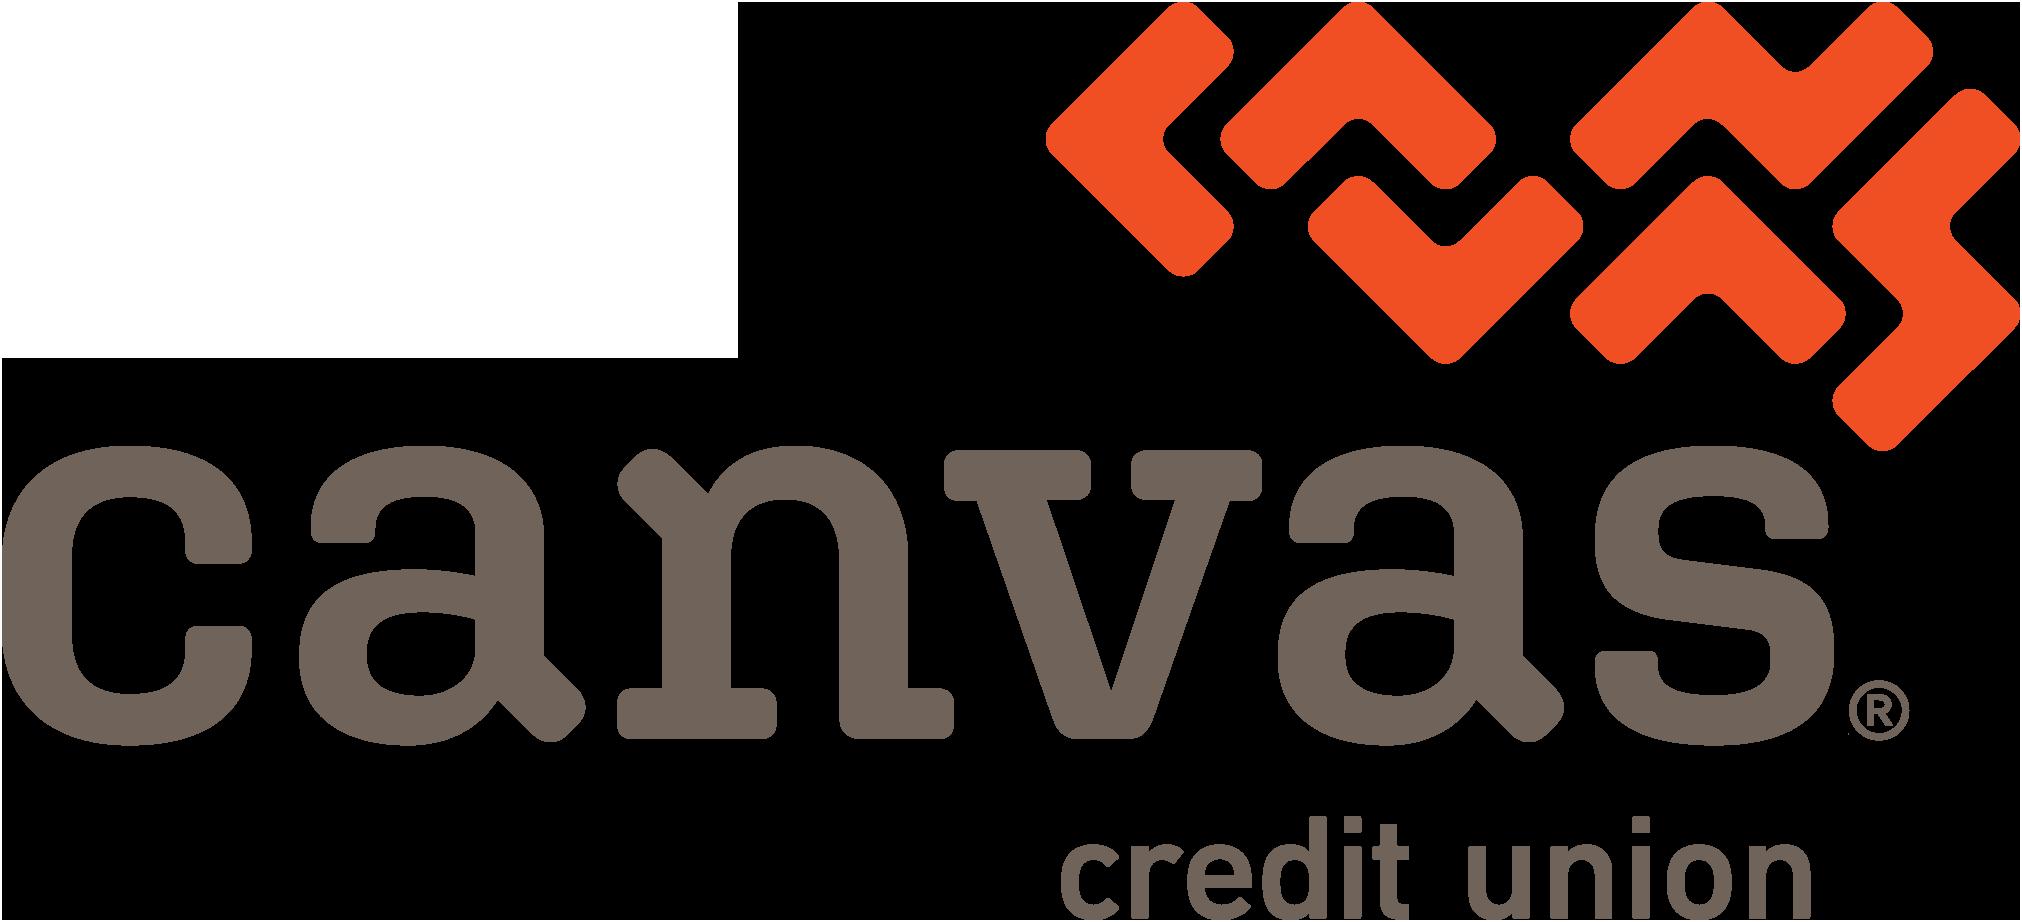 Canvas Credit Union - WorkLife Partnership